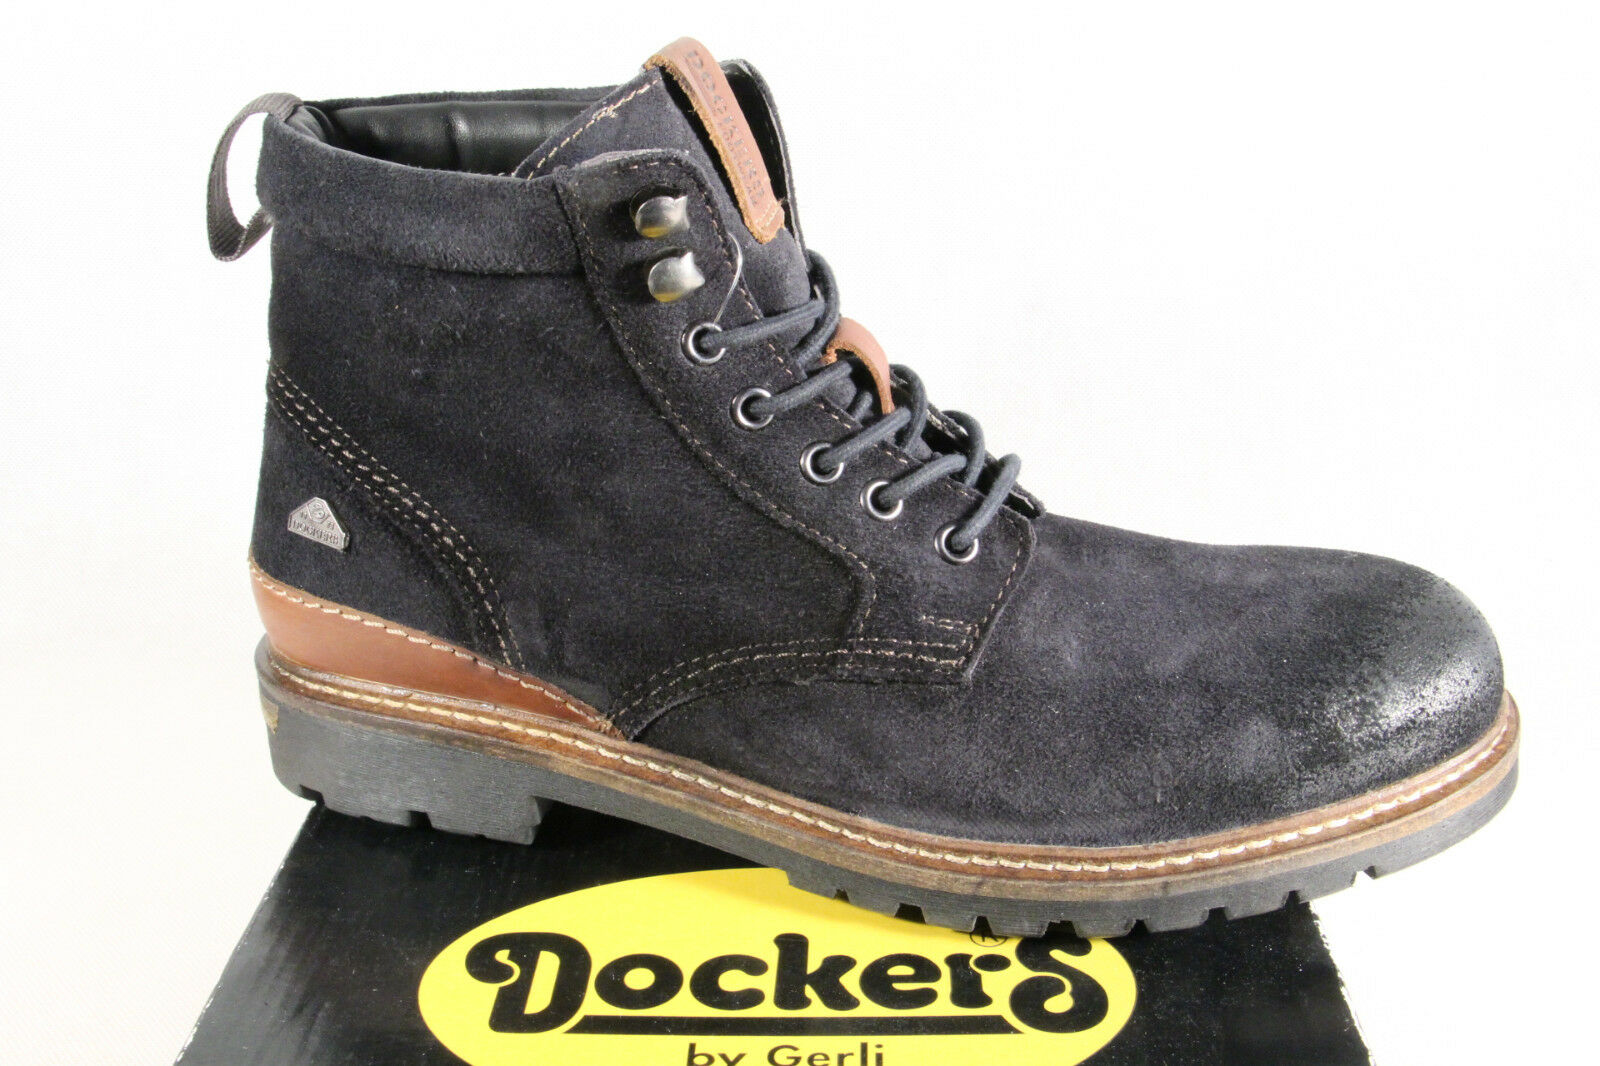 Dockers Stiefel Schnürstiefel Boots Winterstiefel blau Leder used look NEU